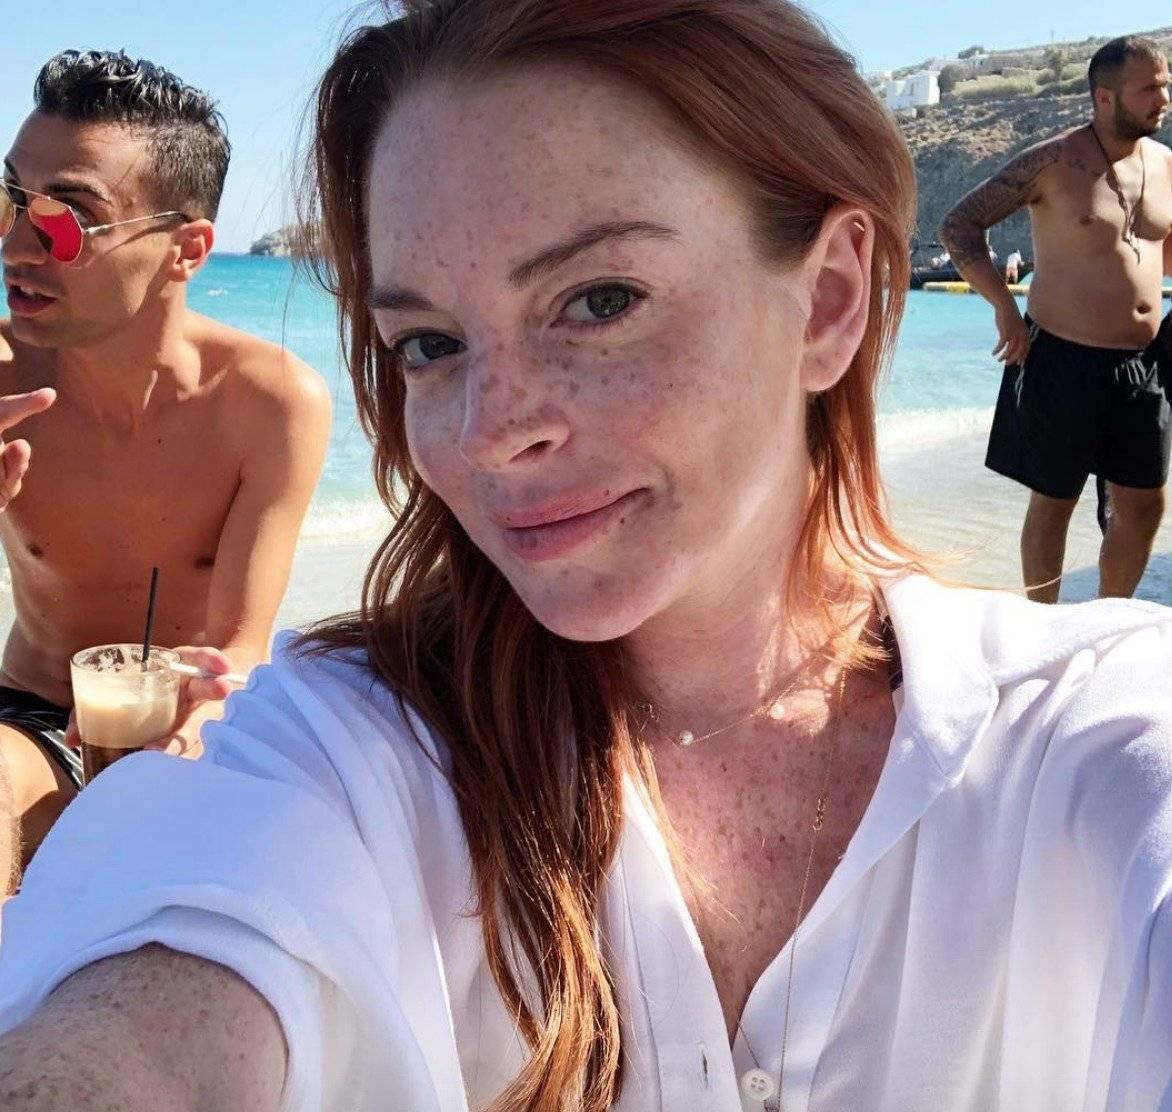 La actriz tuvo una disputa con una familia siria Instagram